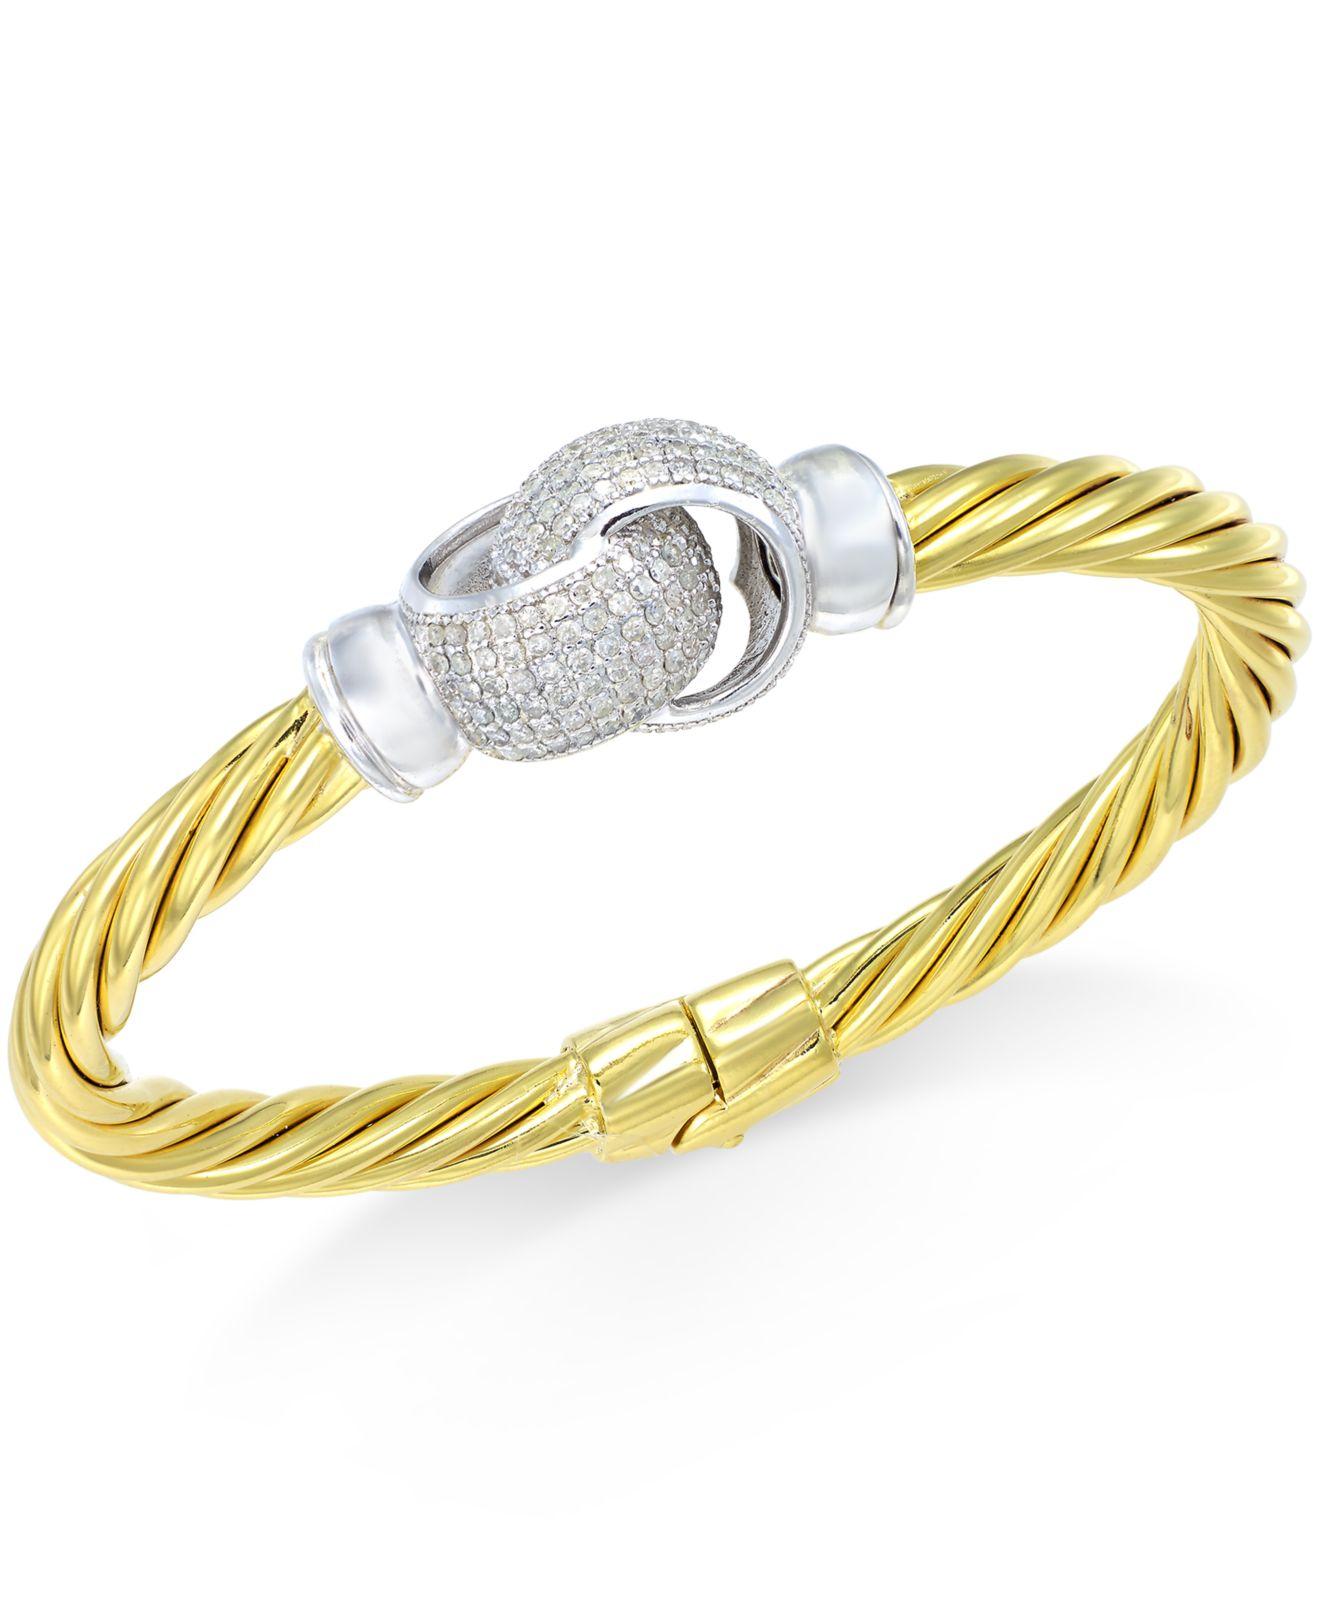 macy s interlocked knot bangle bracelet 1 ct t w